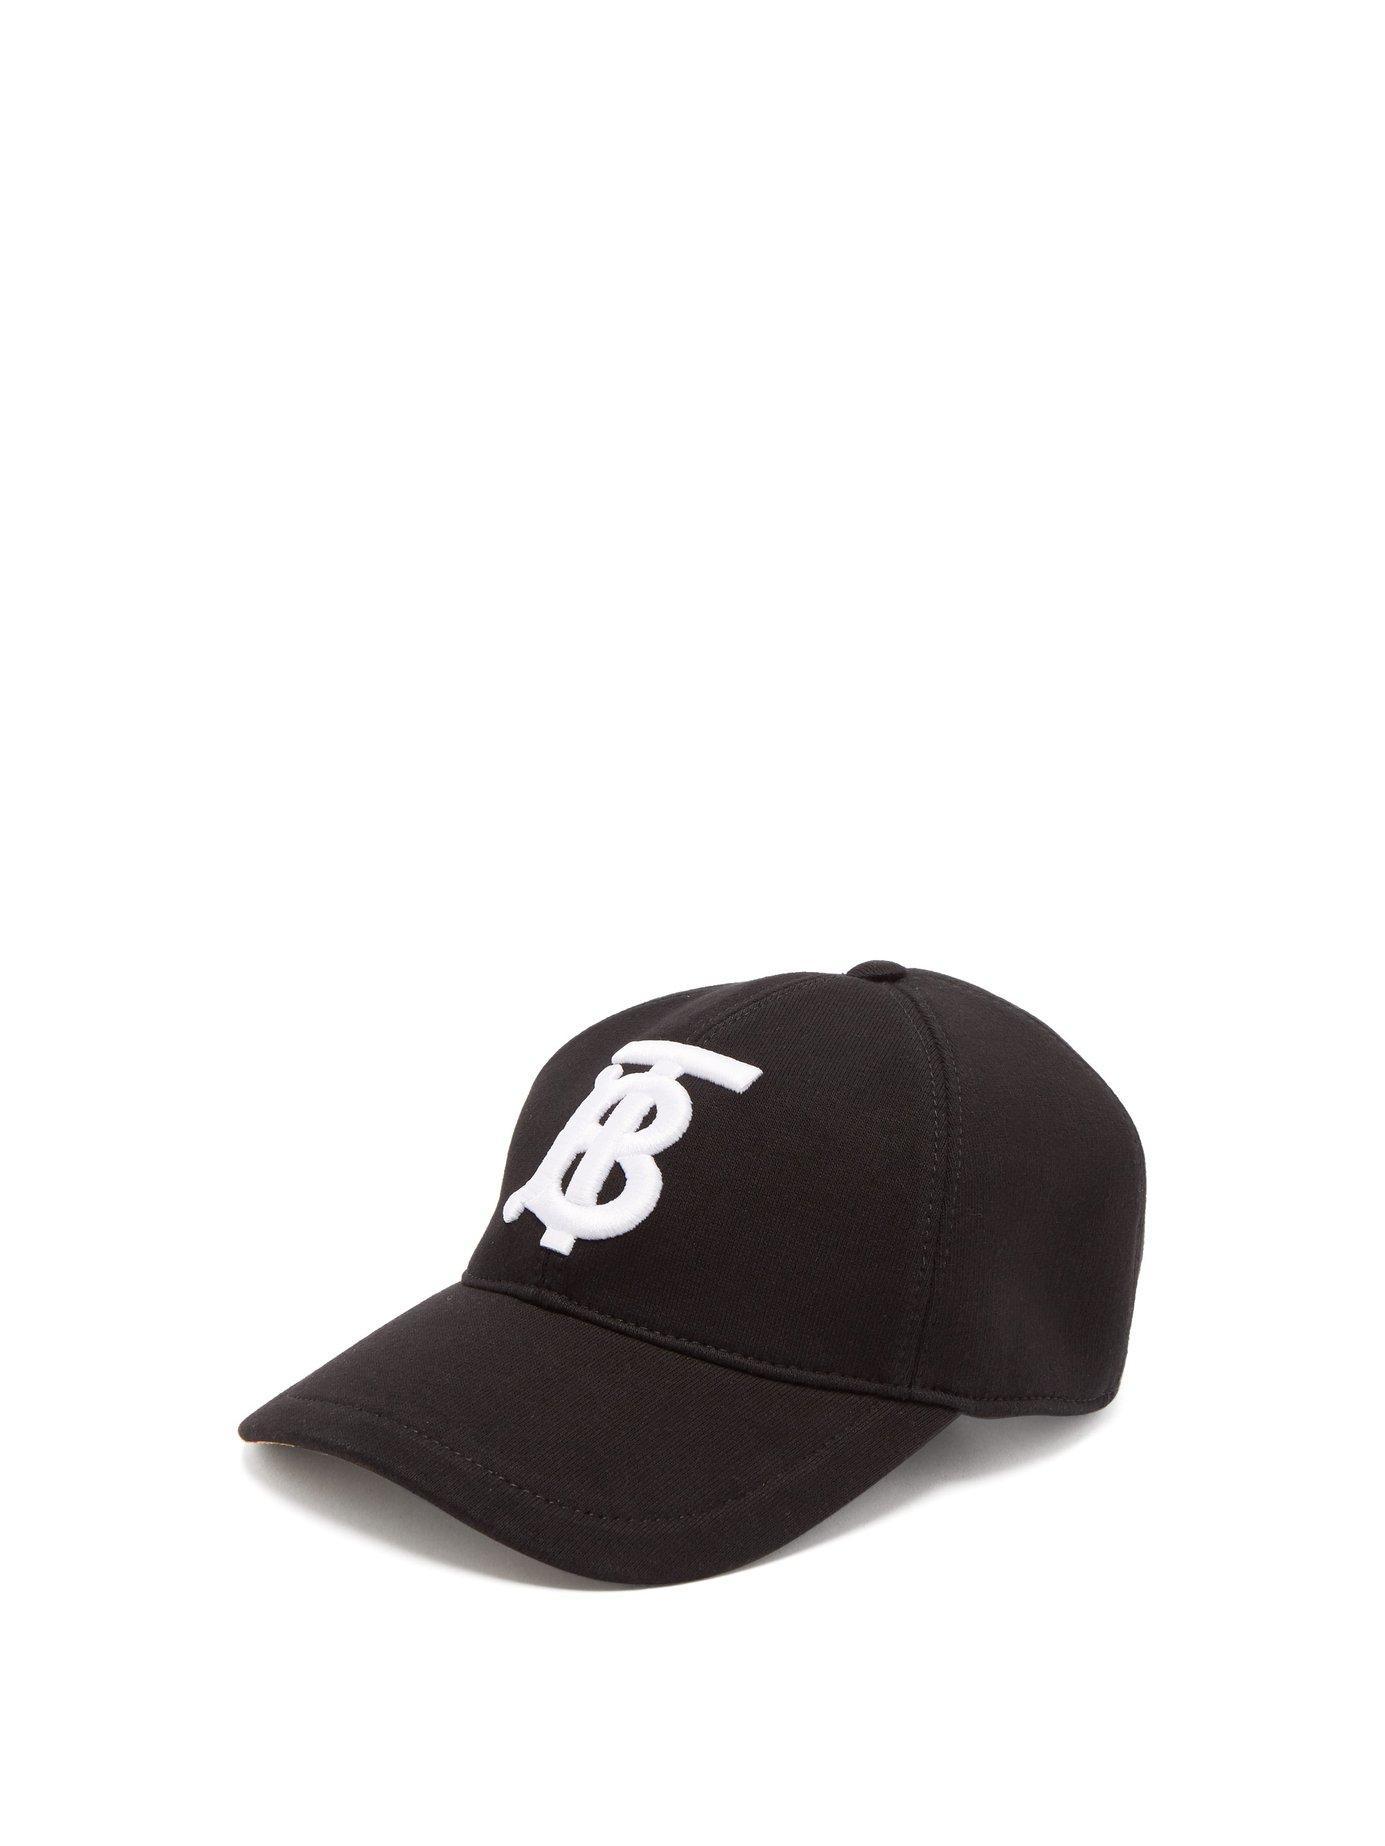 Lyst - Burberry Monogram Motif Baseball Cap in Black - Save 27% 9dc5a29d137